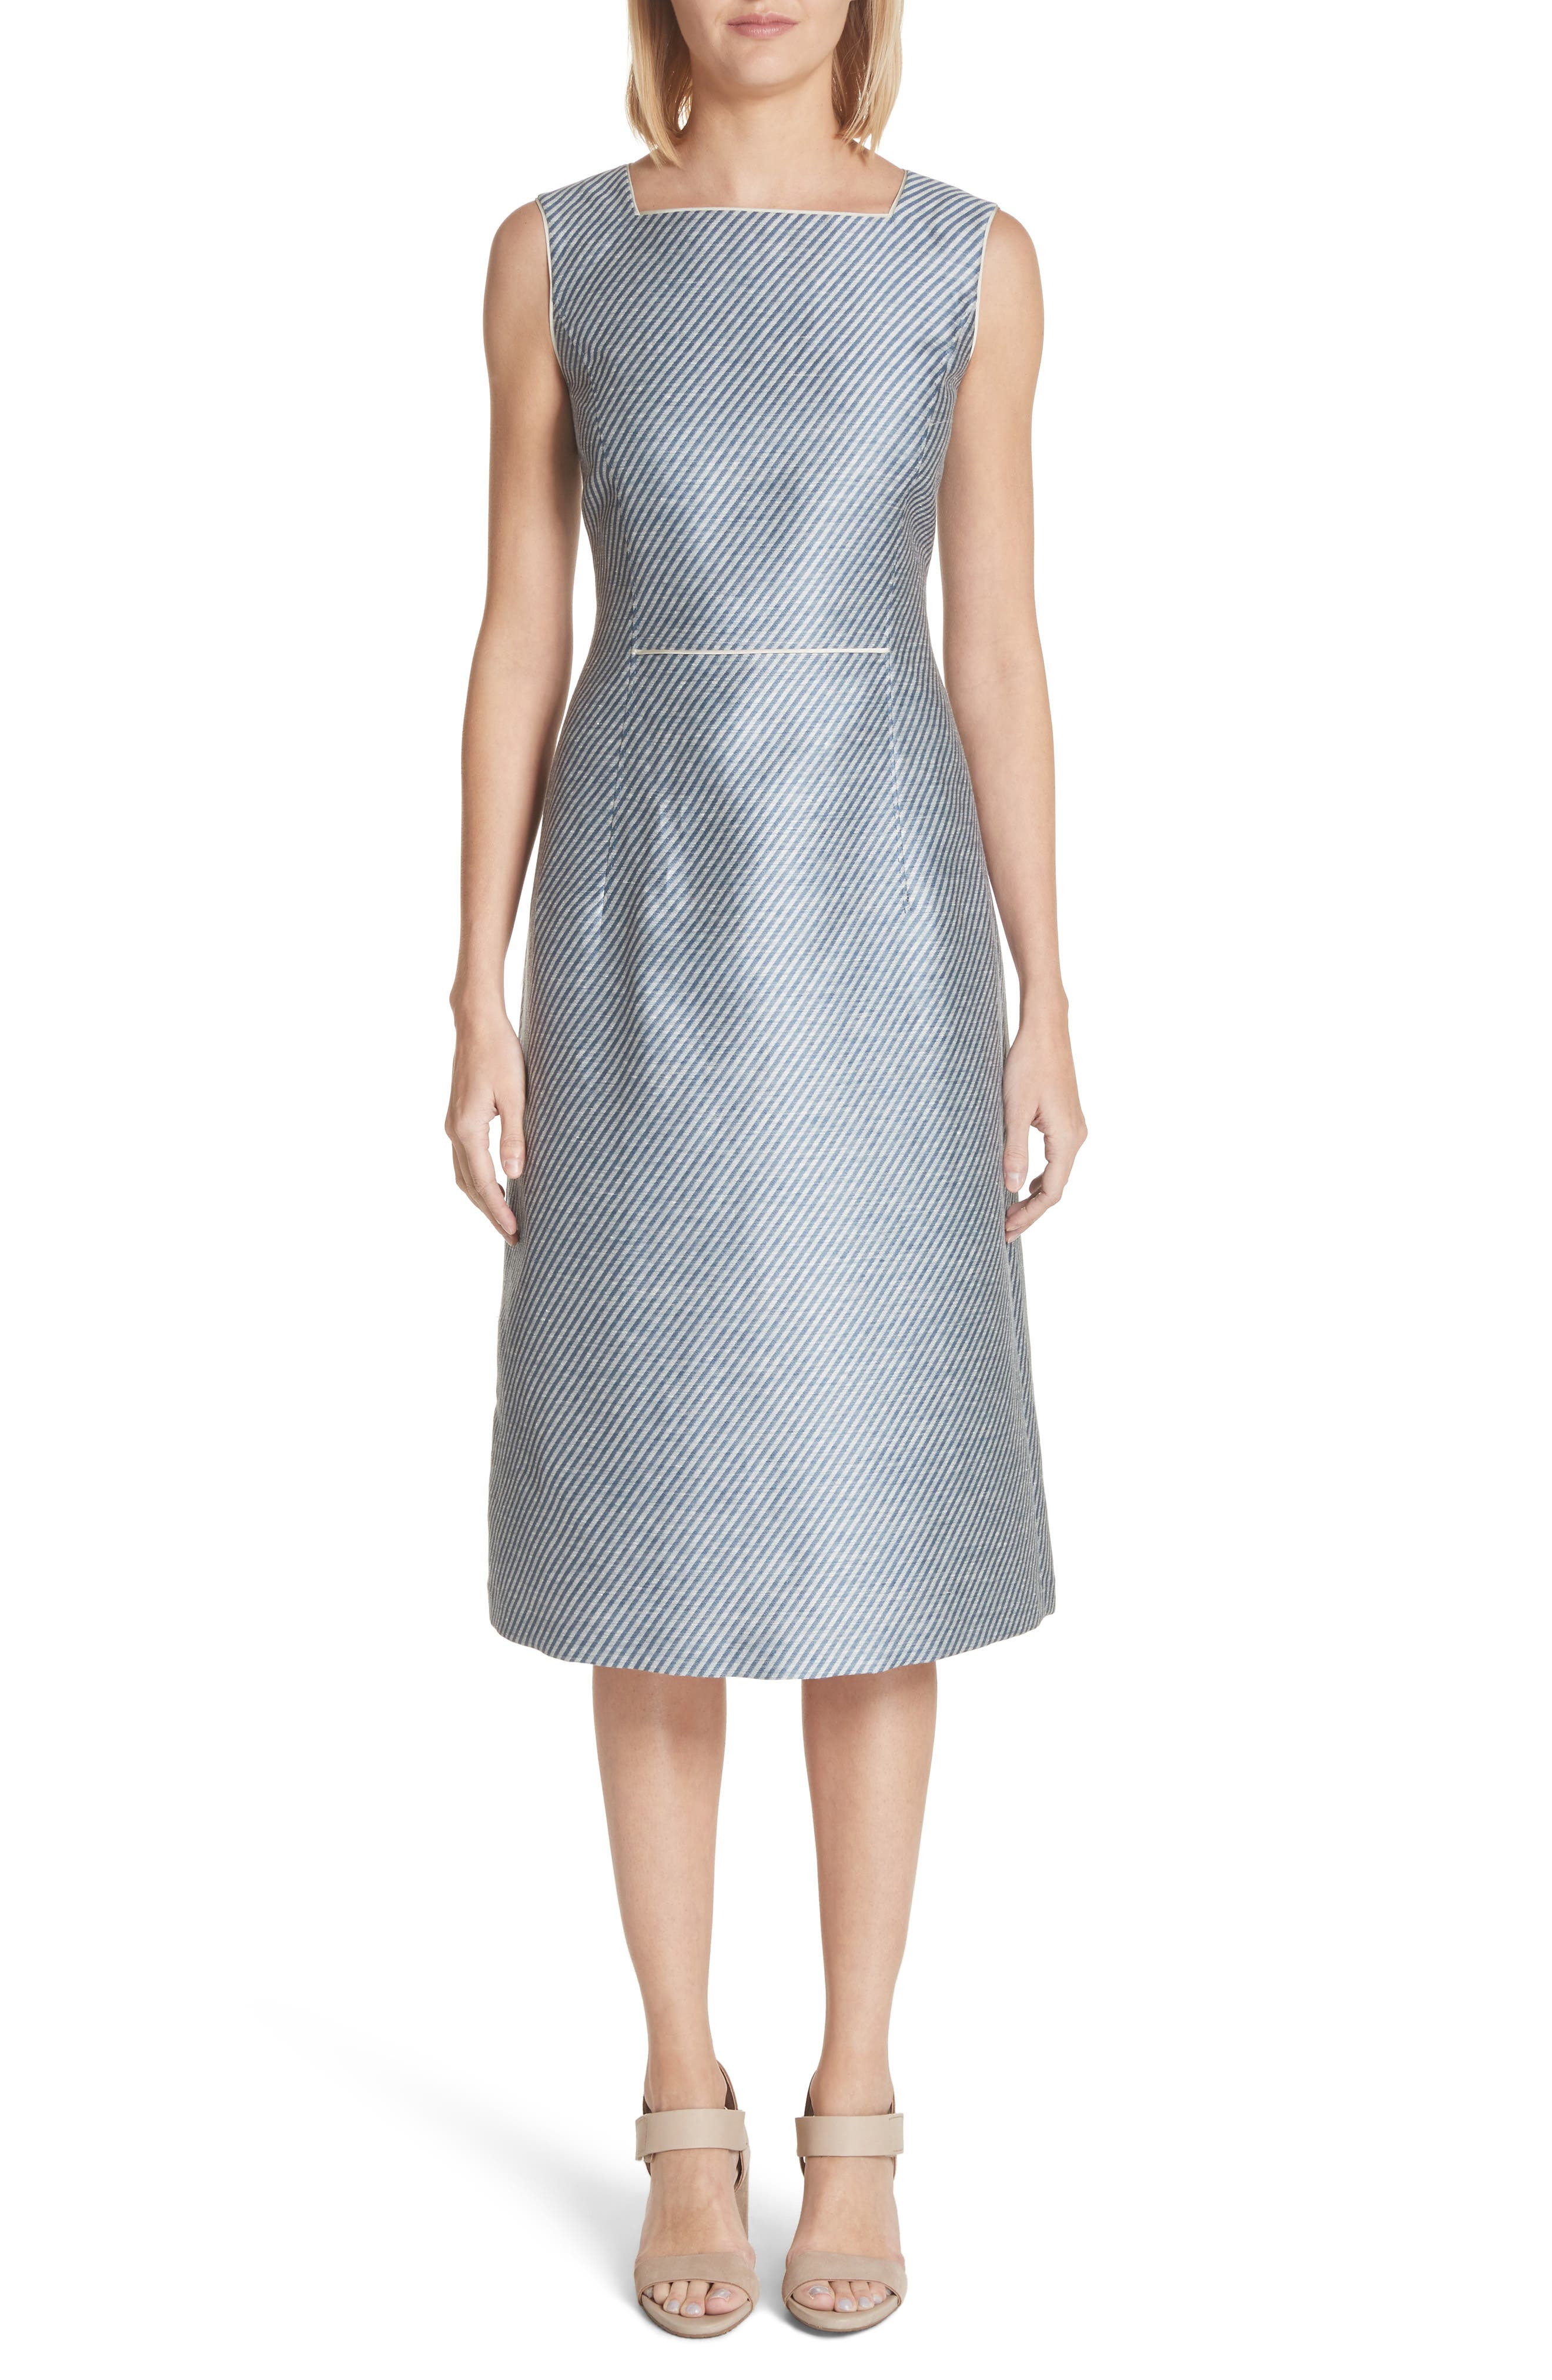 Jojo Sheath Dress,                         Main,                         color, Glaze Blue Multi